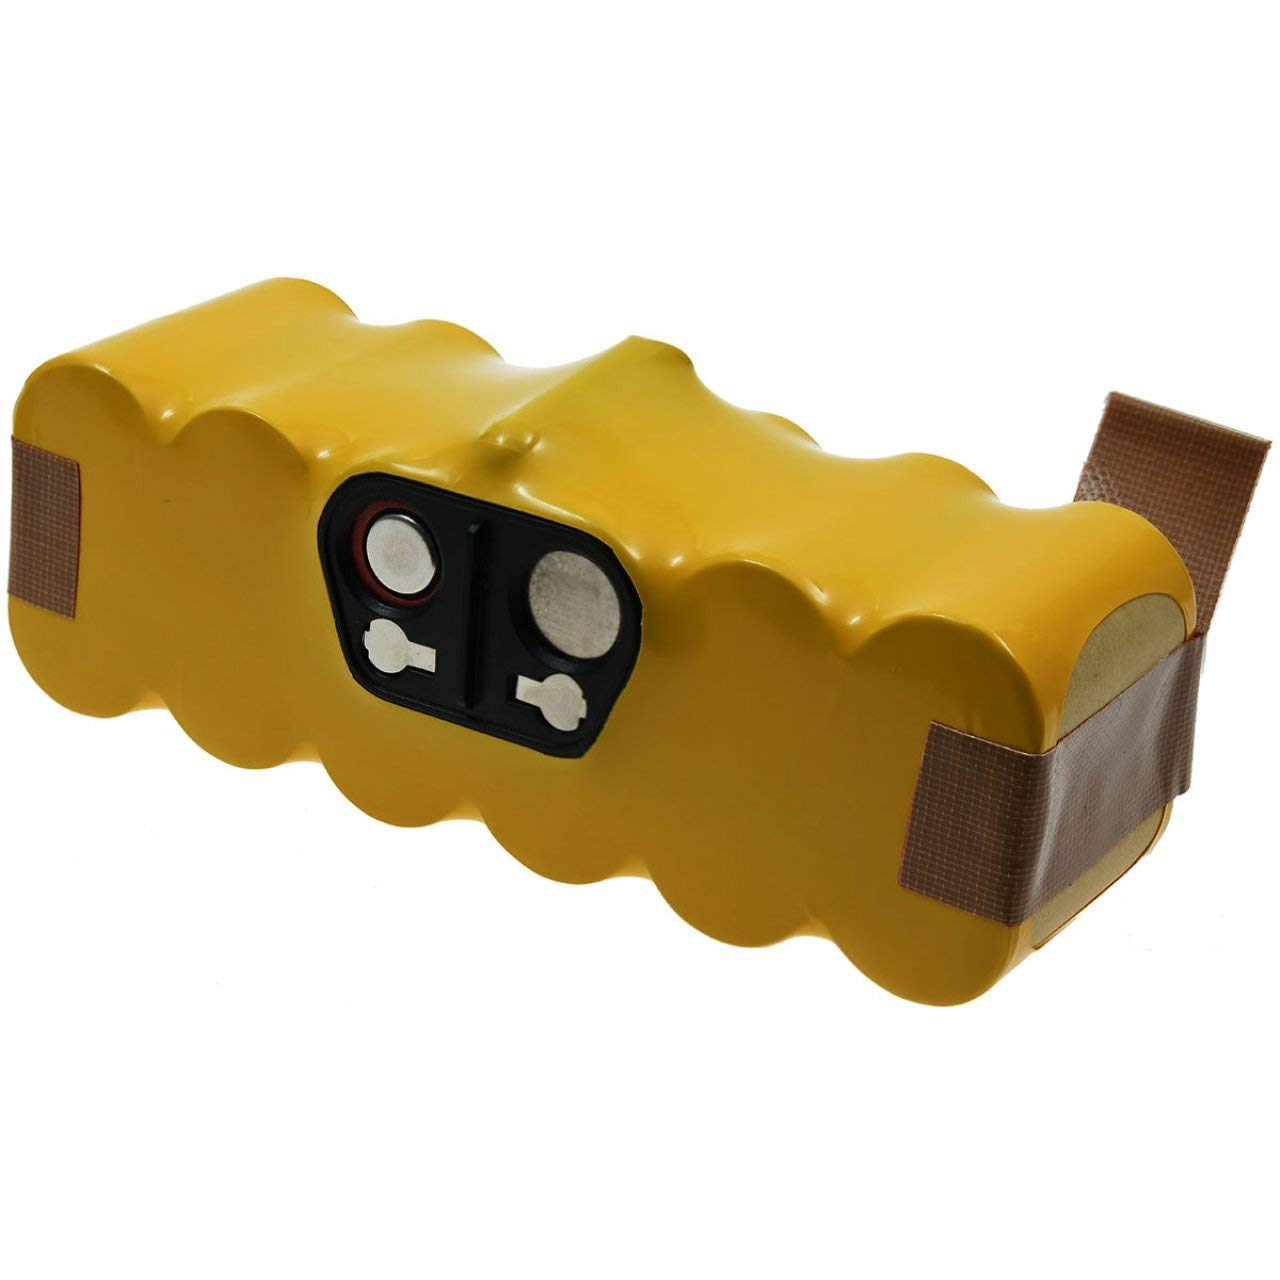 Batteria per Aspirapolvere iRobot Roomba 600-Serie